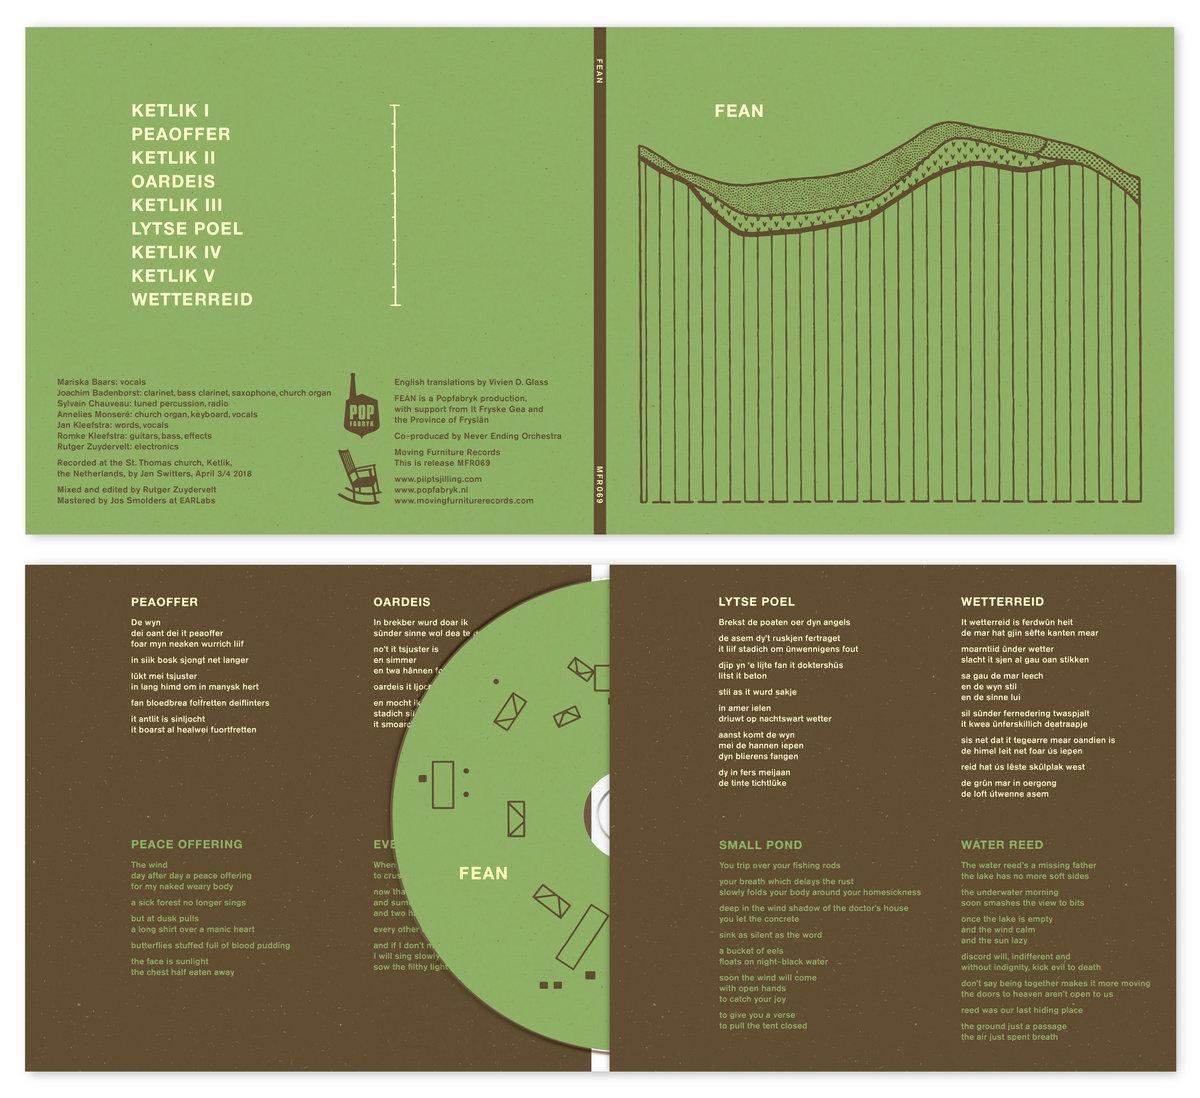 Te amei pra. | edson & hudson – download and listen to the album.